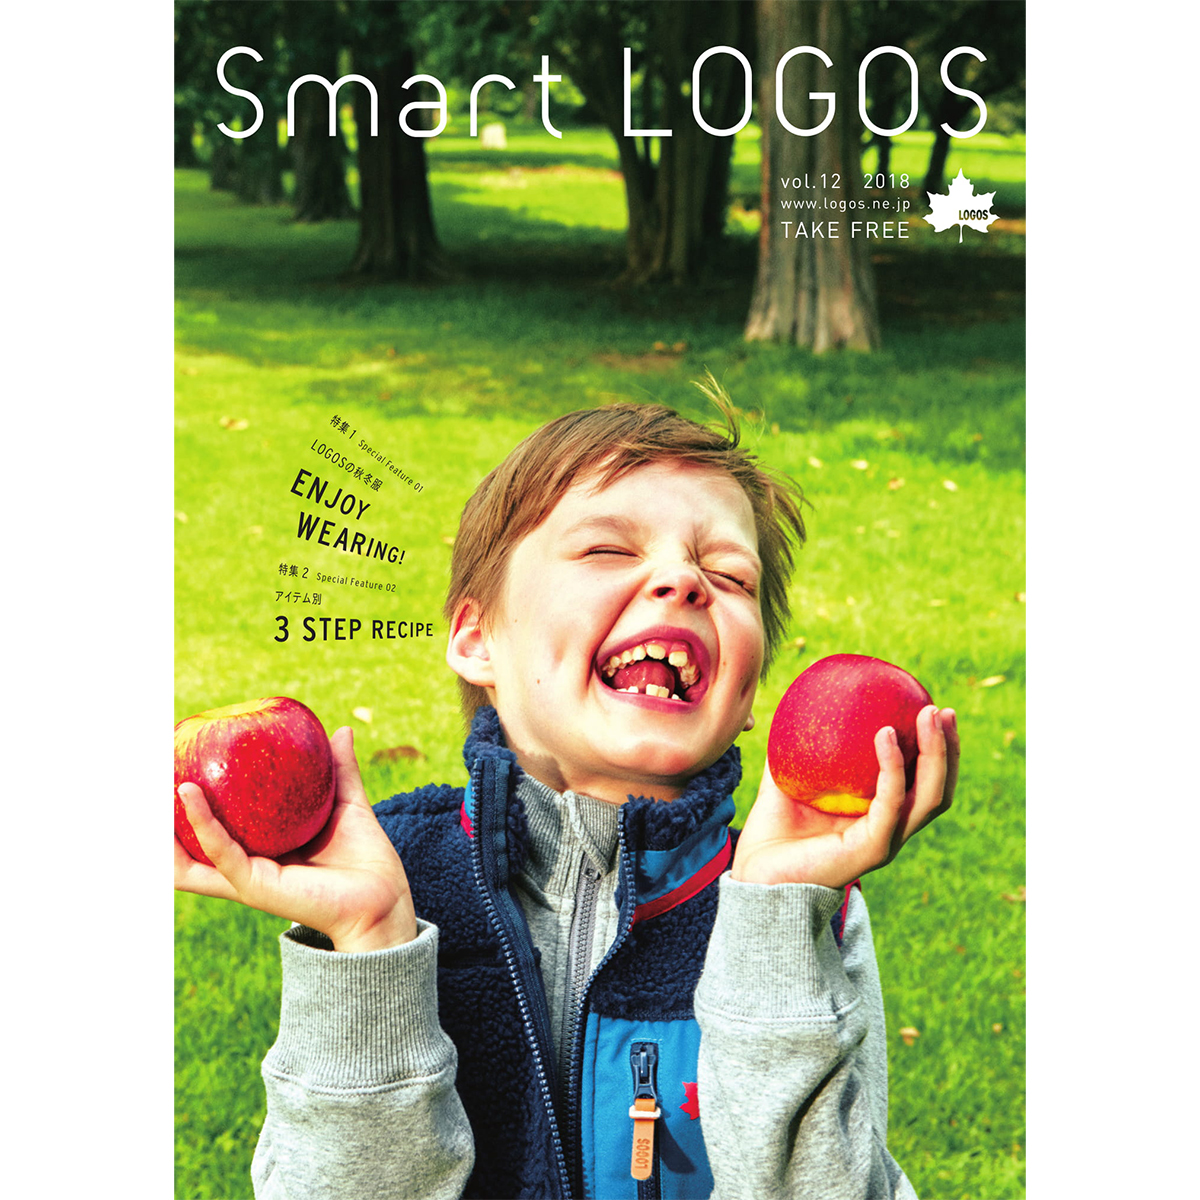 Smart LOGOS Vol.12